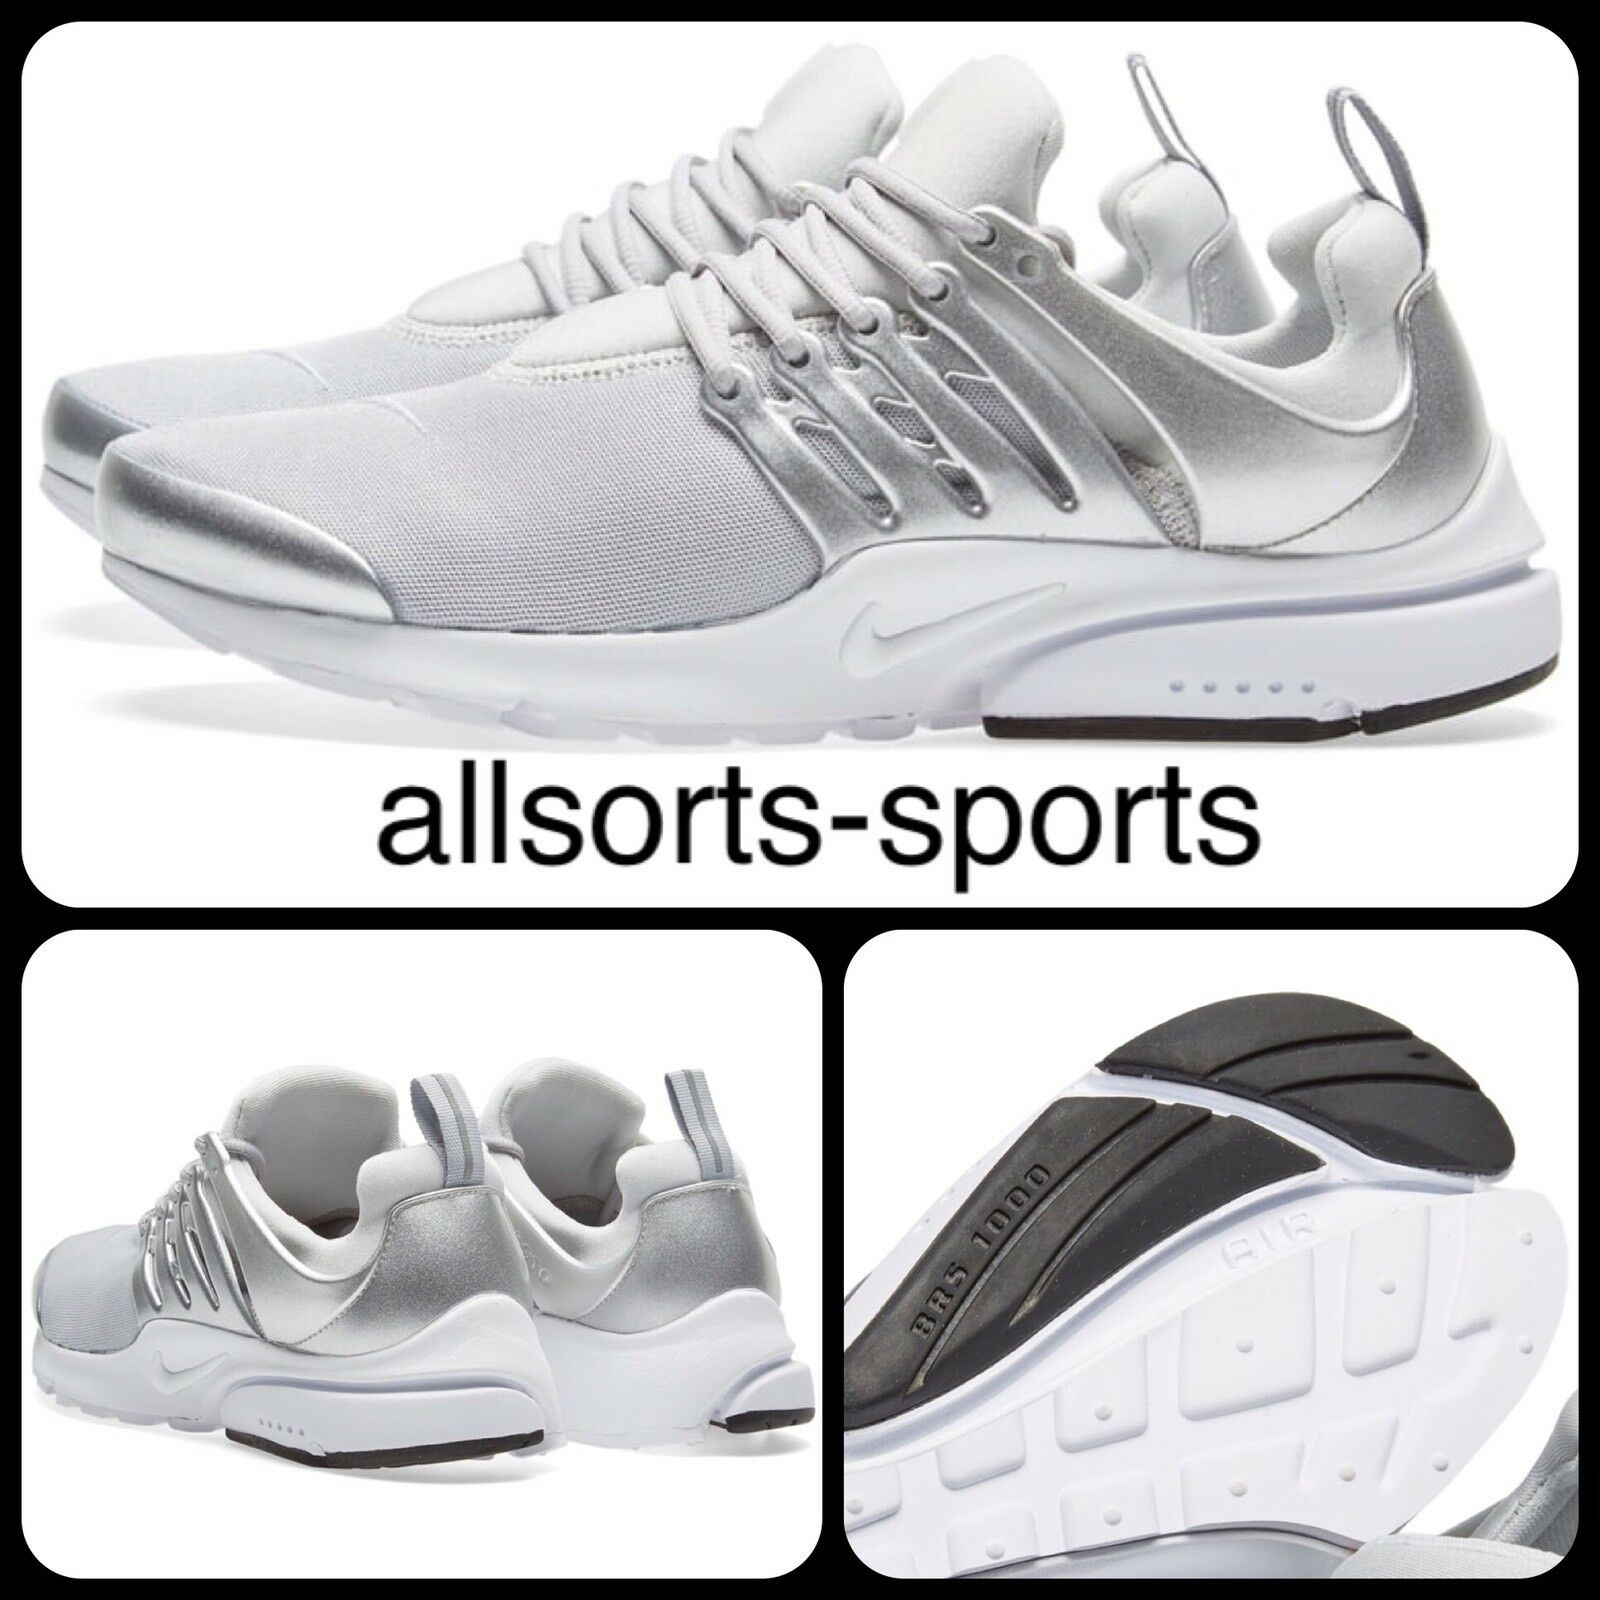 1S81 Nike Air Presto Premium EUR 47.5 848141-001 Platino Argento Metallizzato